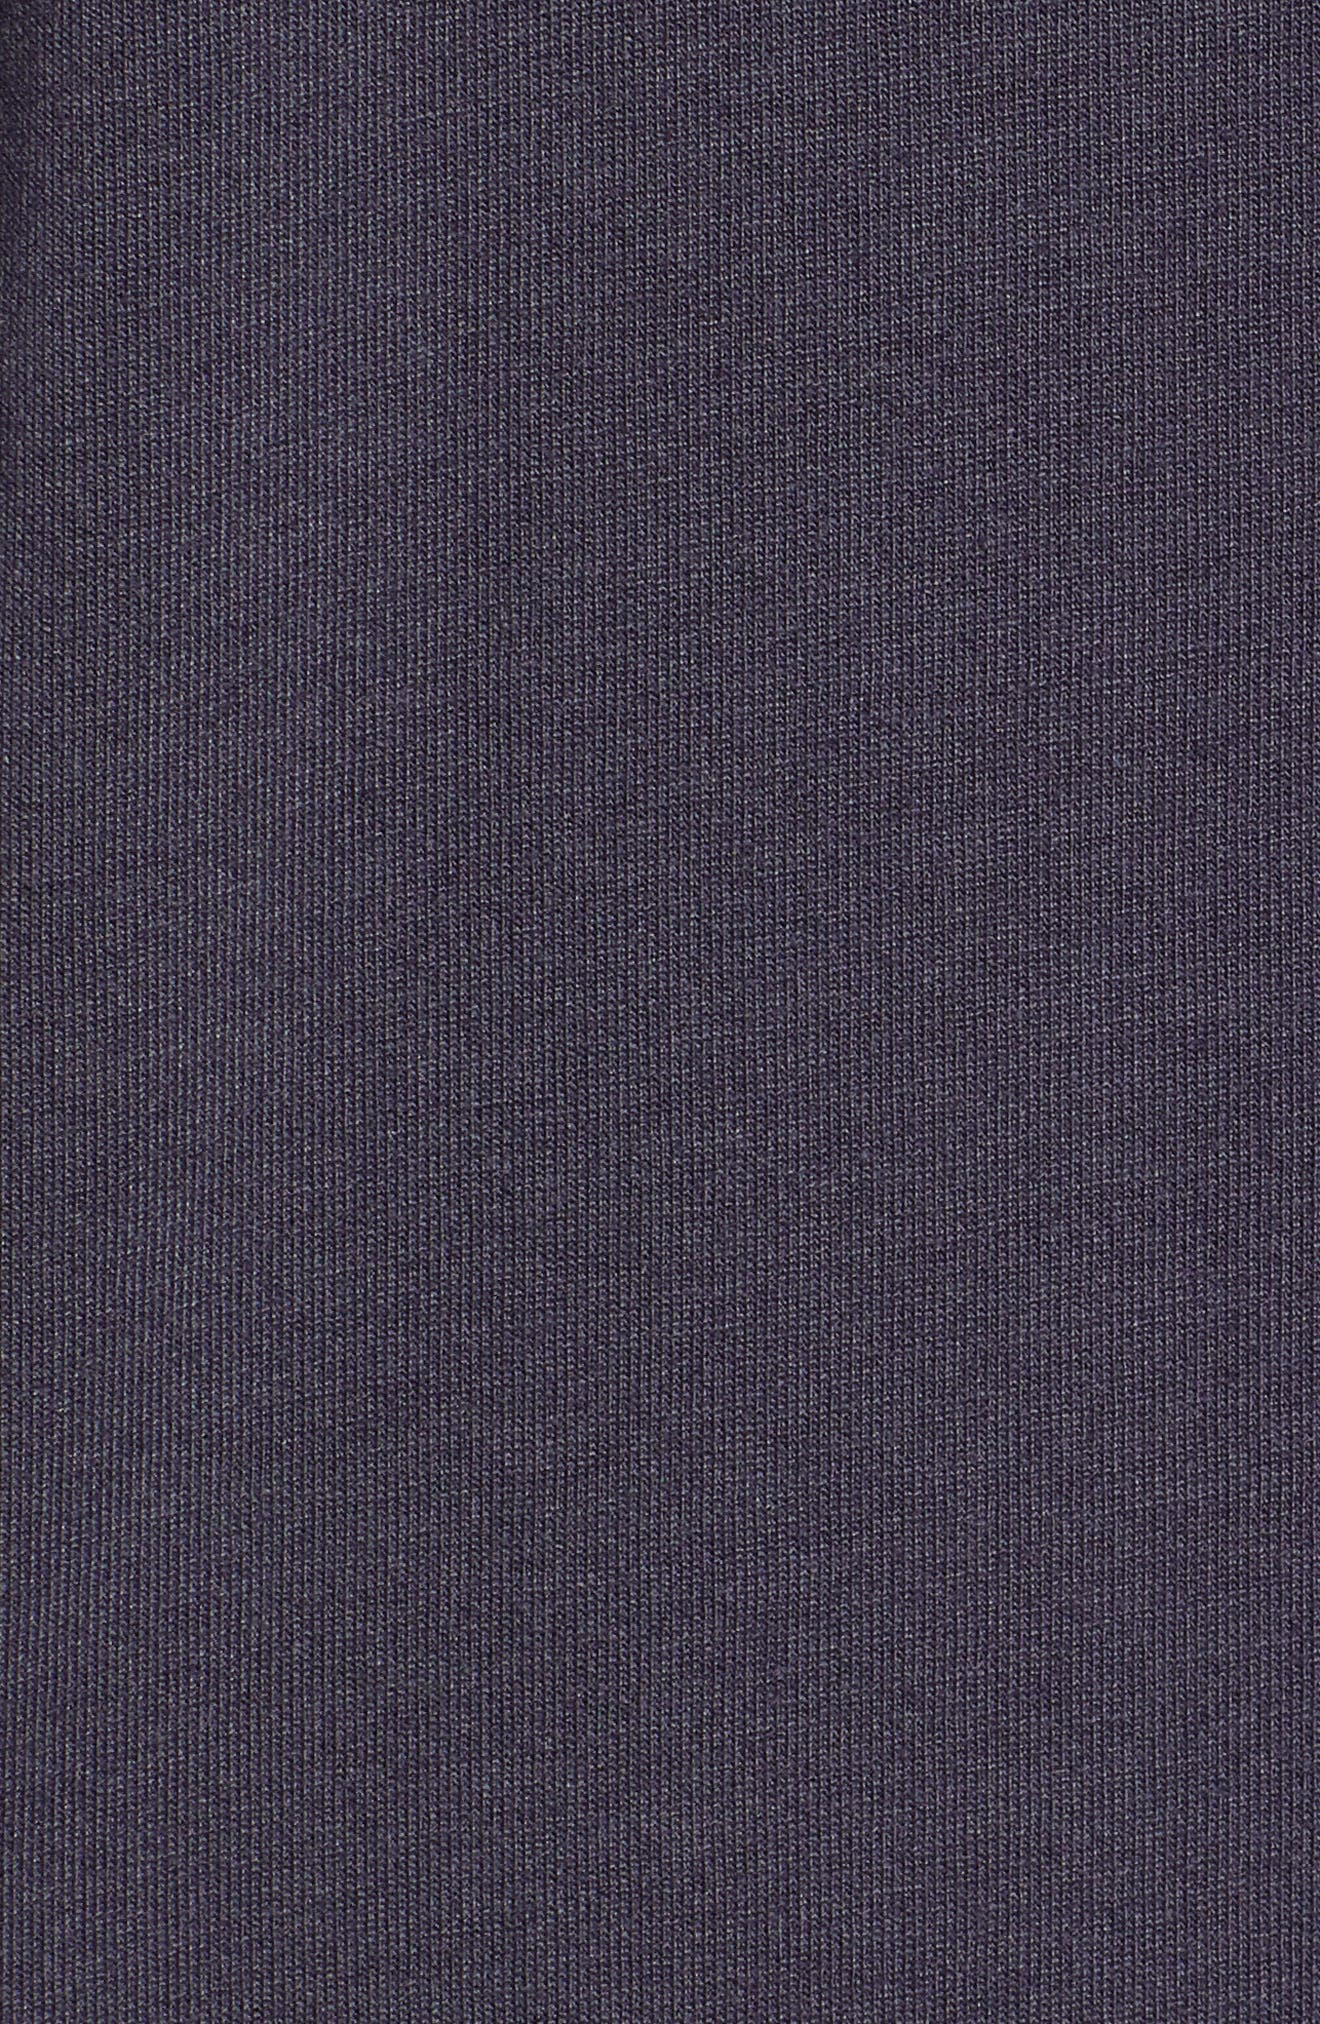 Dry Running Division T-Shirt,                             Alternate thumbnail 5, color,                             GRIDIRON/ GUNSMOKE